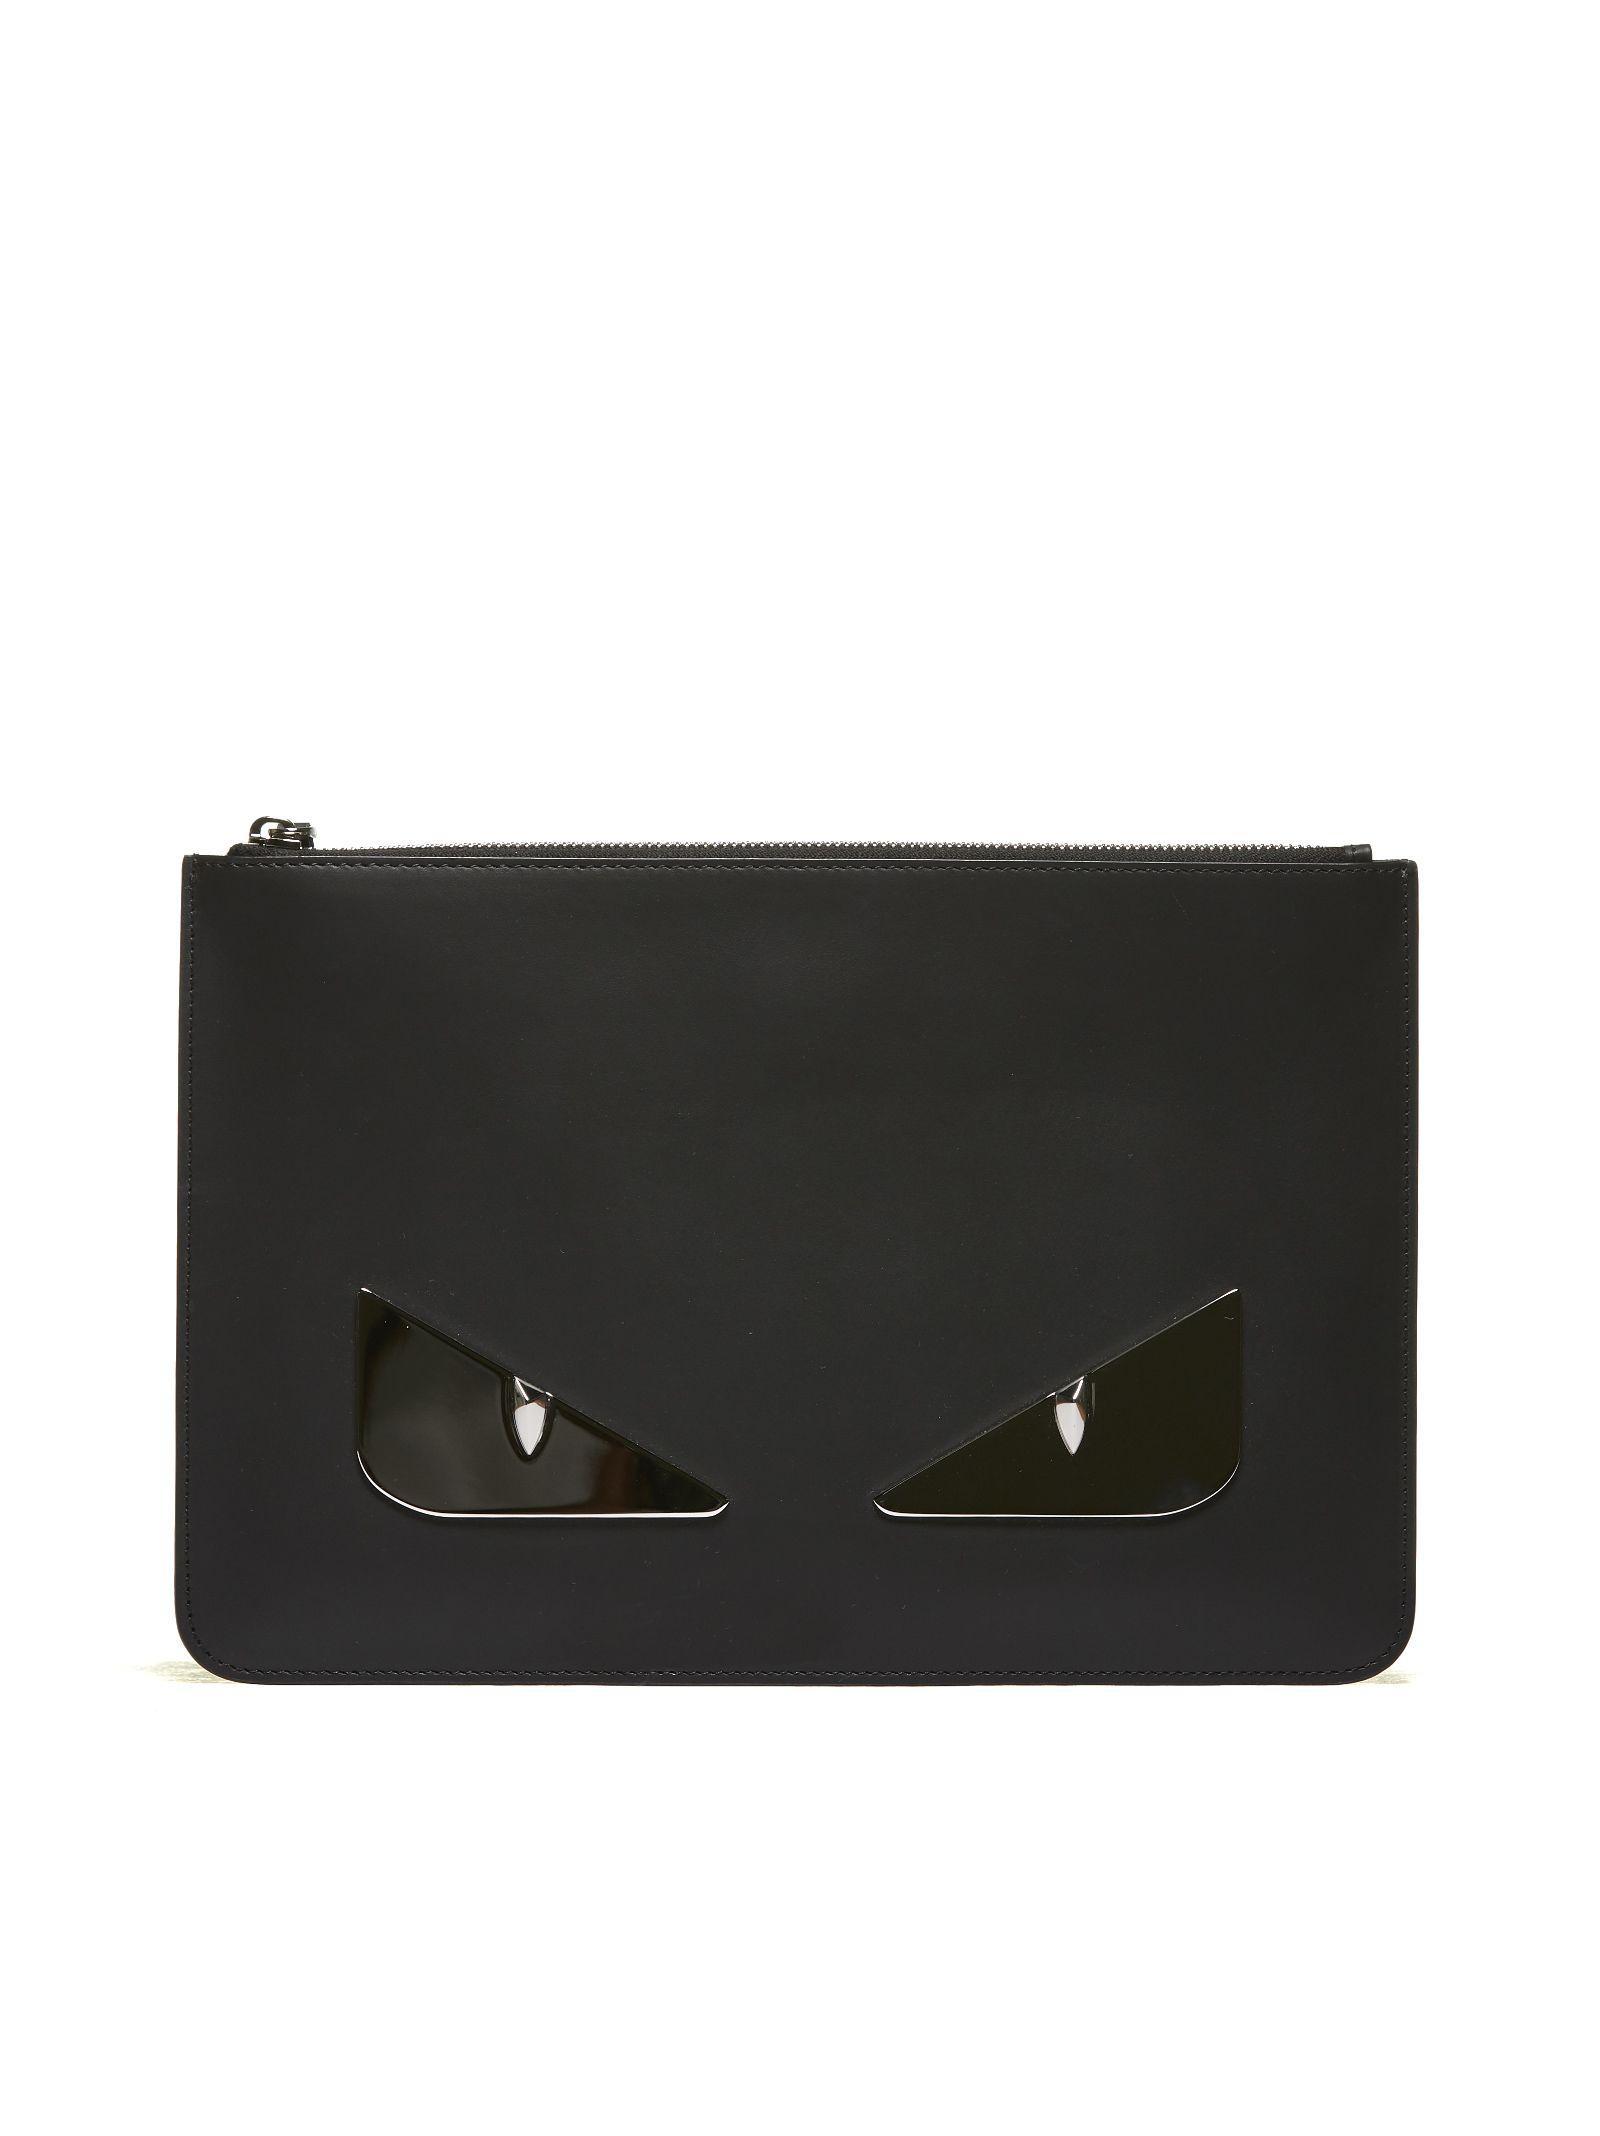 6f8179bbc4cf Fendi Bag Bugs Clutch Bags In Nero Argento